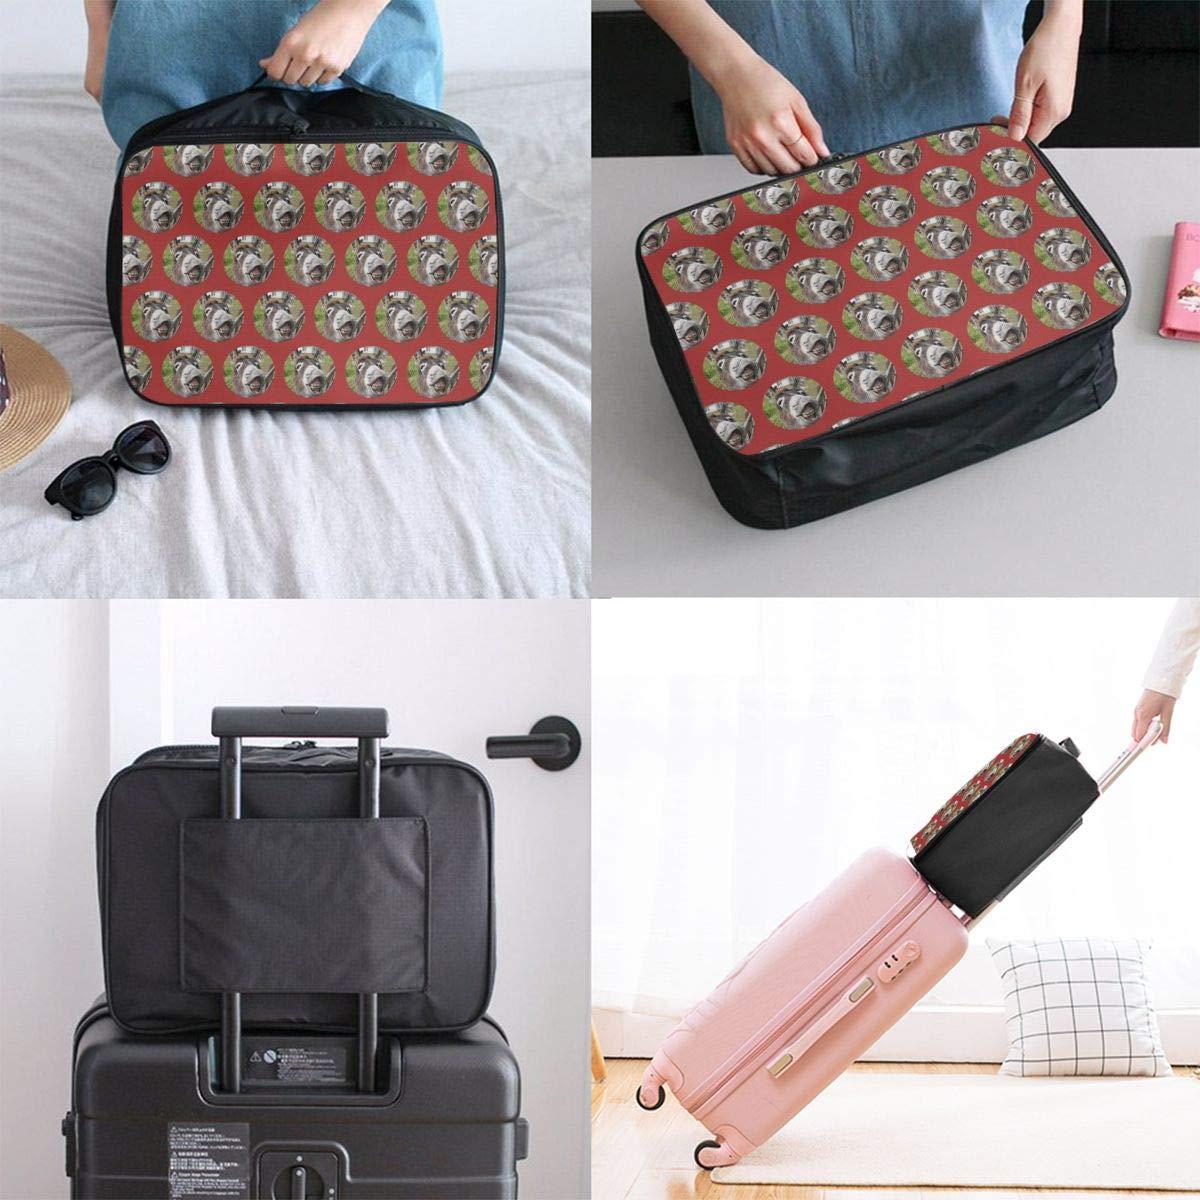 Funny Donkey Travel Duffel Bag Waterproof Fashion Lightweight Large Capacity Portable Luggage Bag